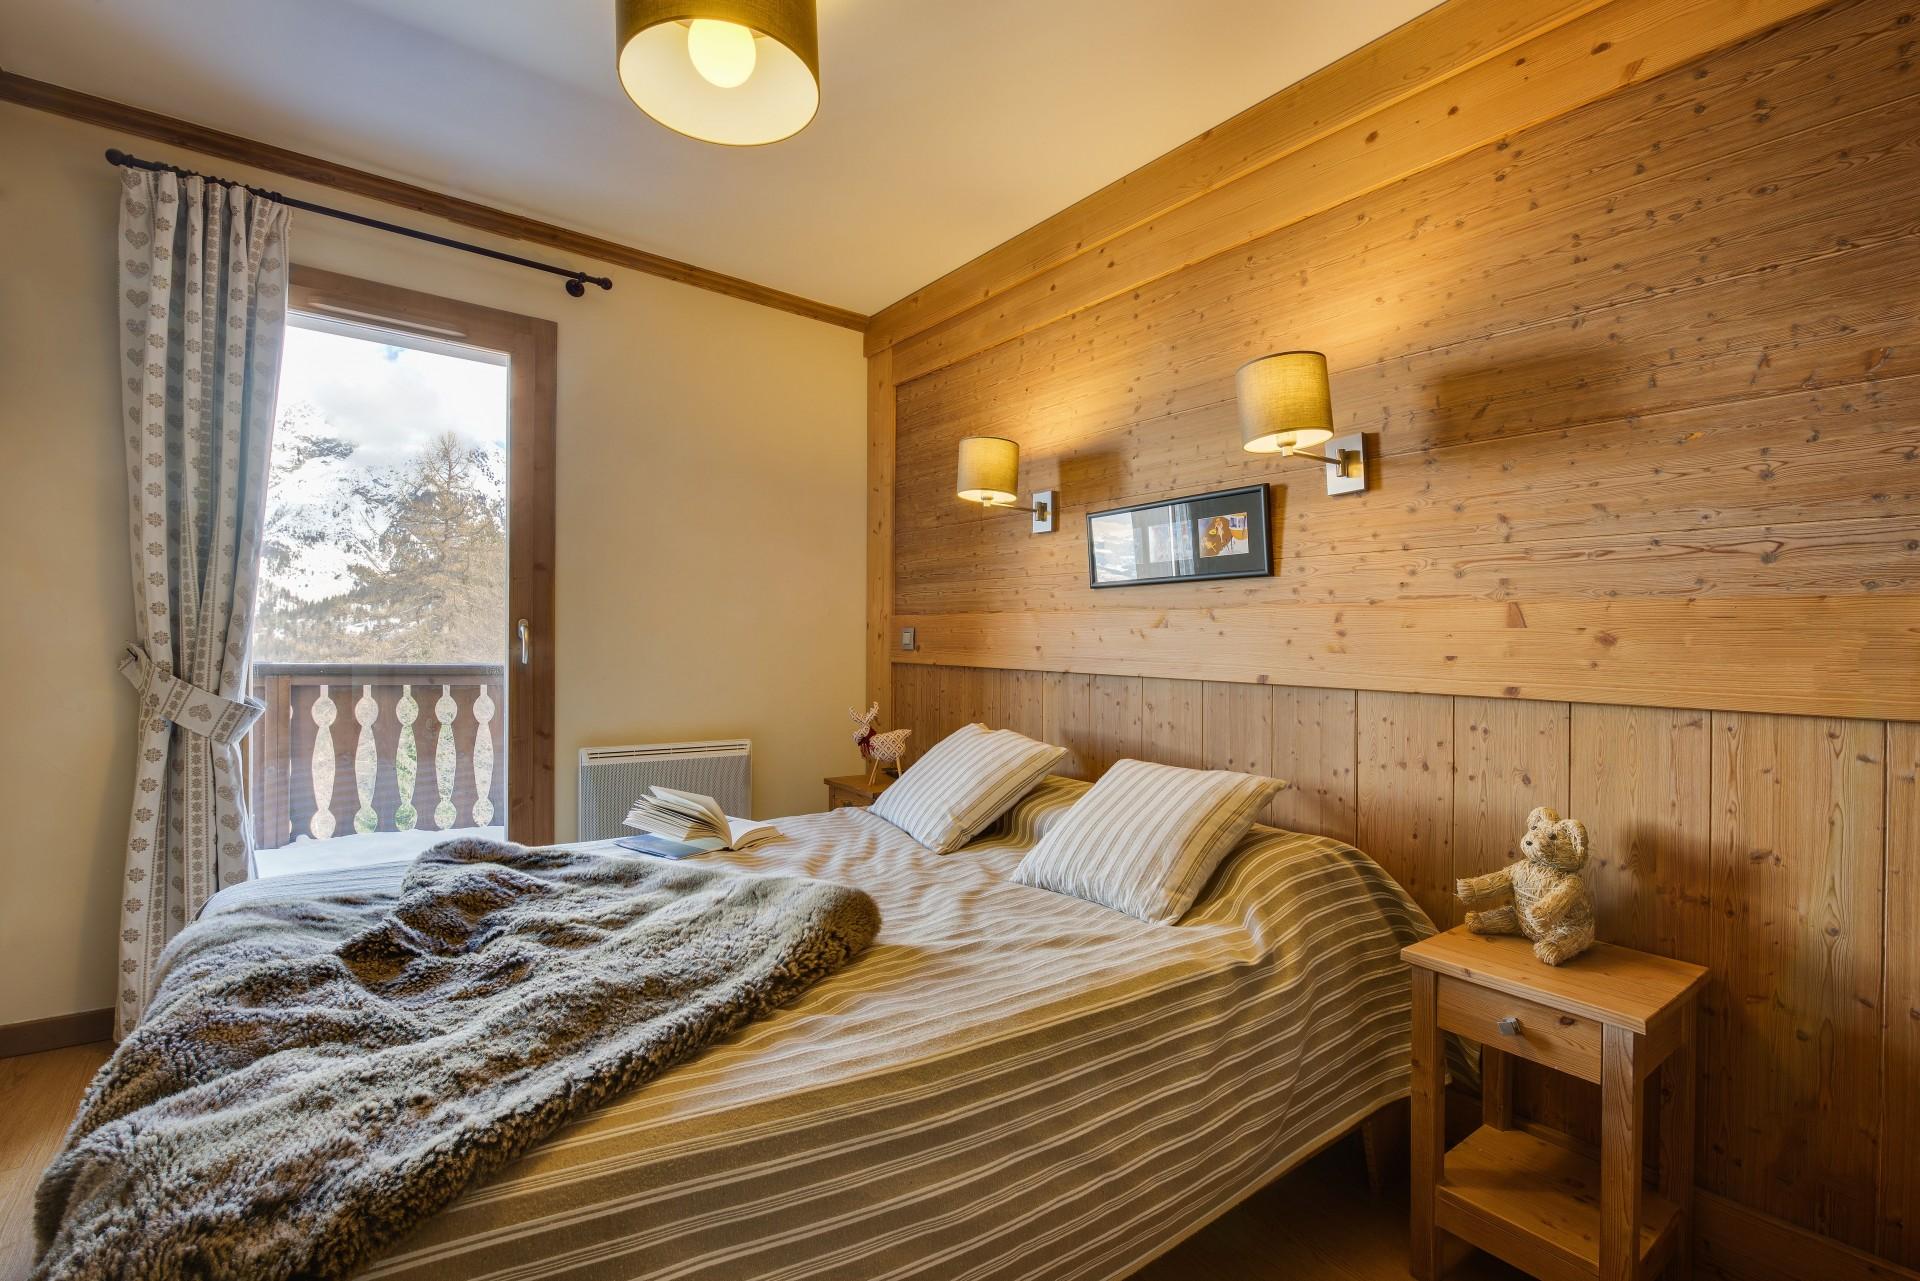 Sainte Foy Tarentaise Location Appartement Luxe Romerite Duplex Chambre